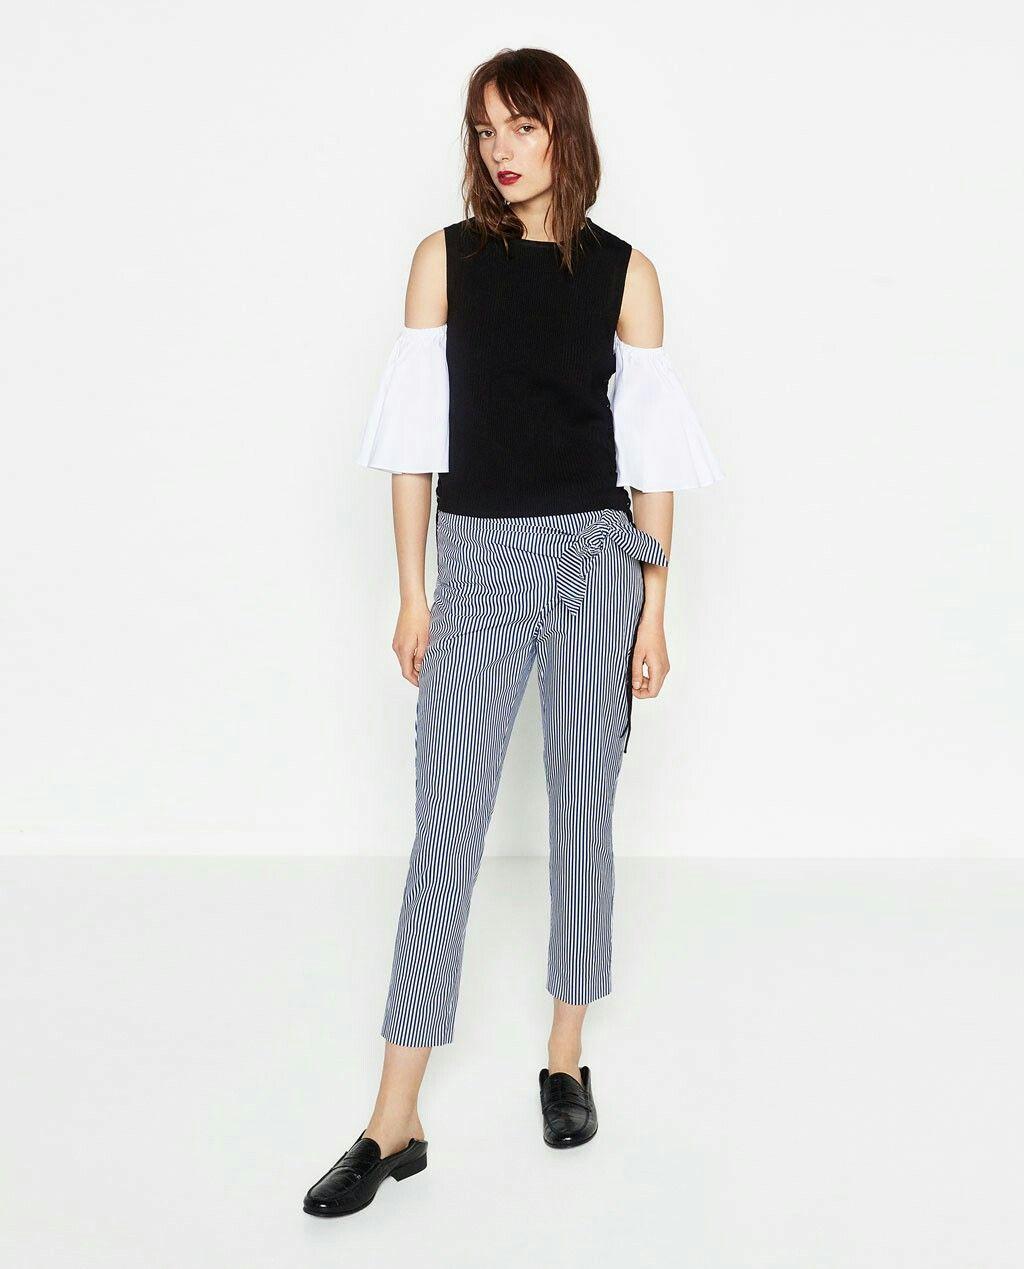 Estilo Promoción De Verano Mujeres Pantalones Personal Unidos A 2016 Rayas Estados Zara Pantalones Popelín Mujer Rayas qwtcx7OA